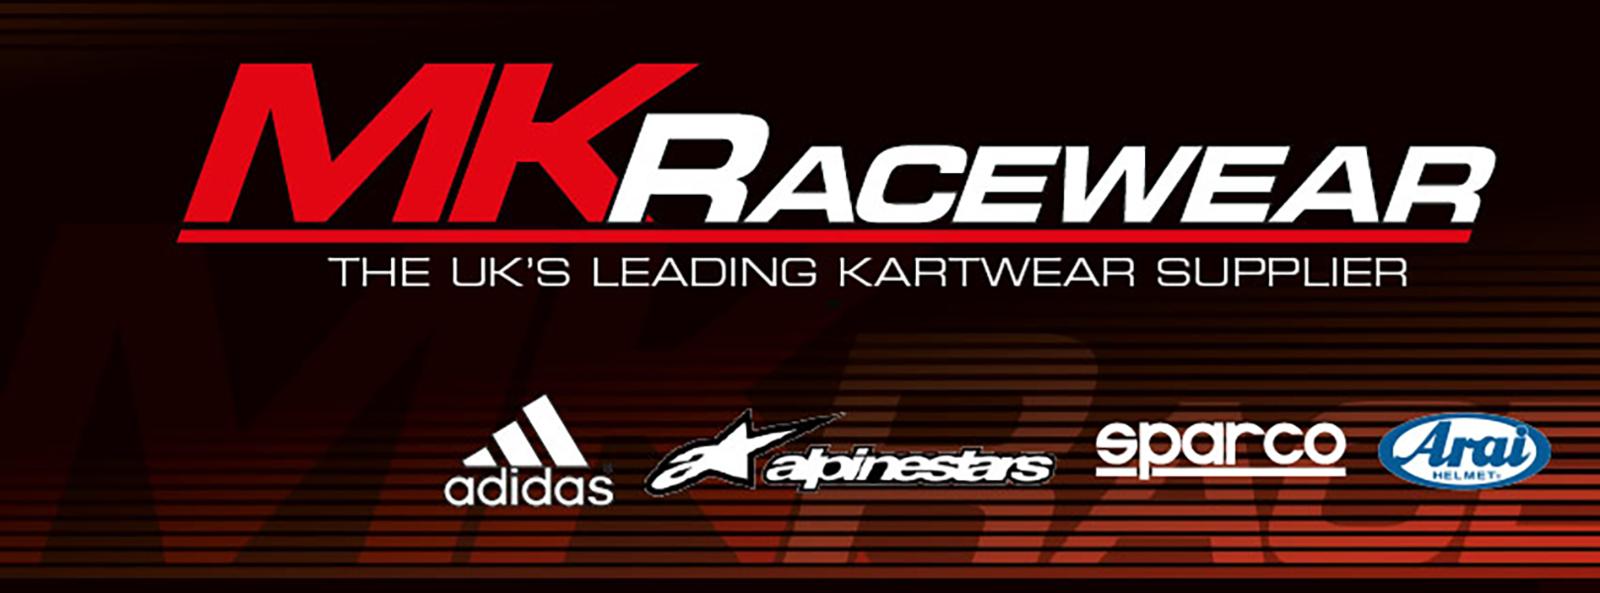 MK-Racewear.png